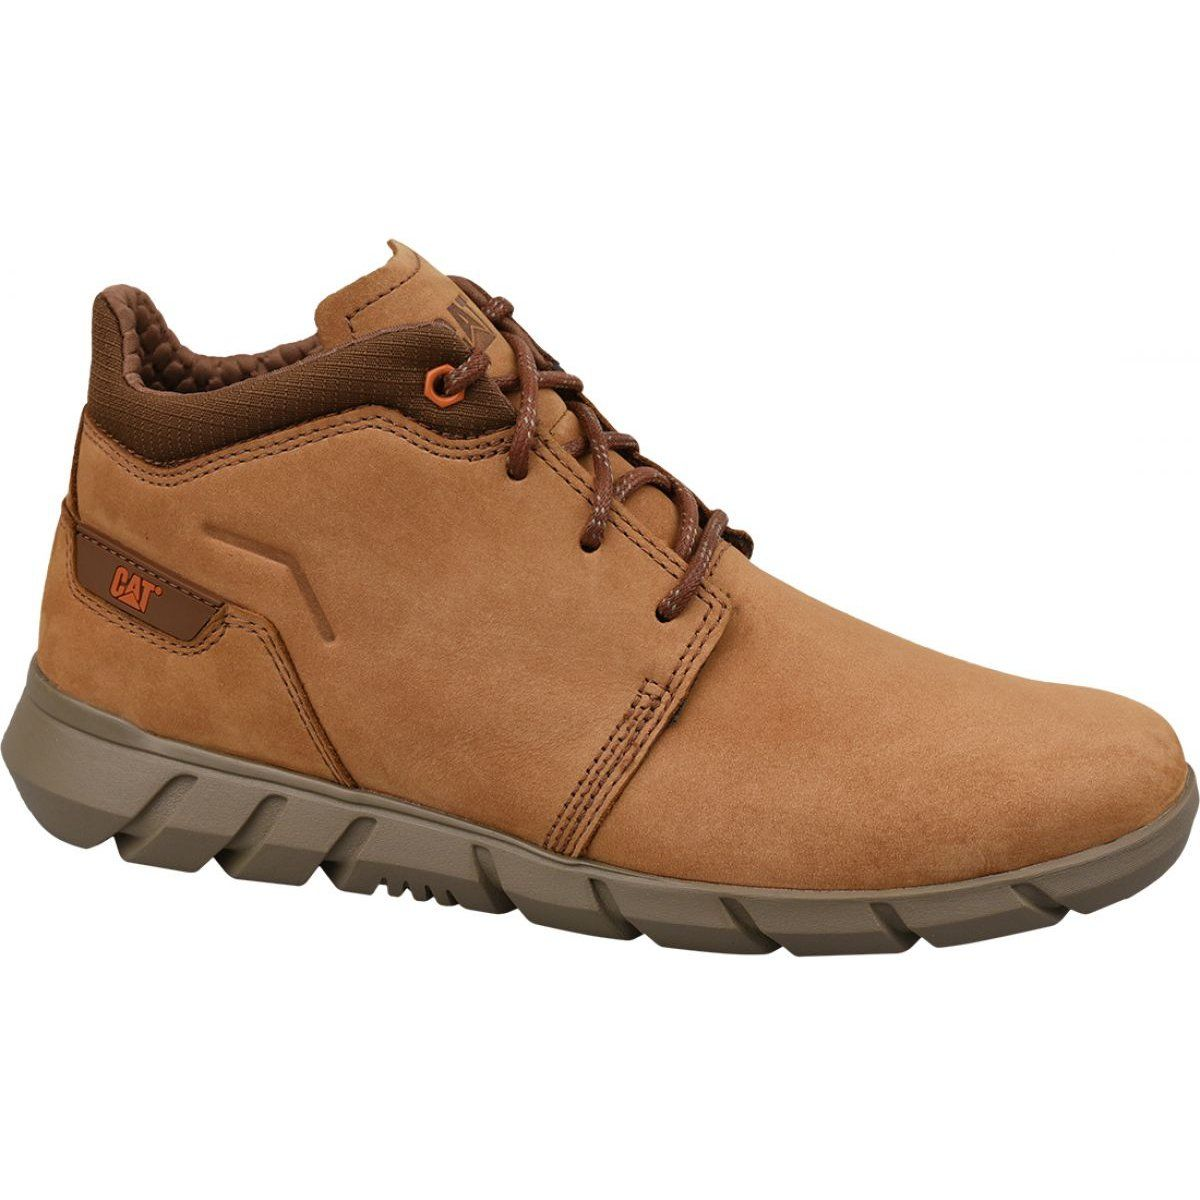 Buty Caterpillar Hendon M P723517 Brazowe Boots Hiking Boots Shoes